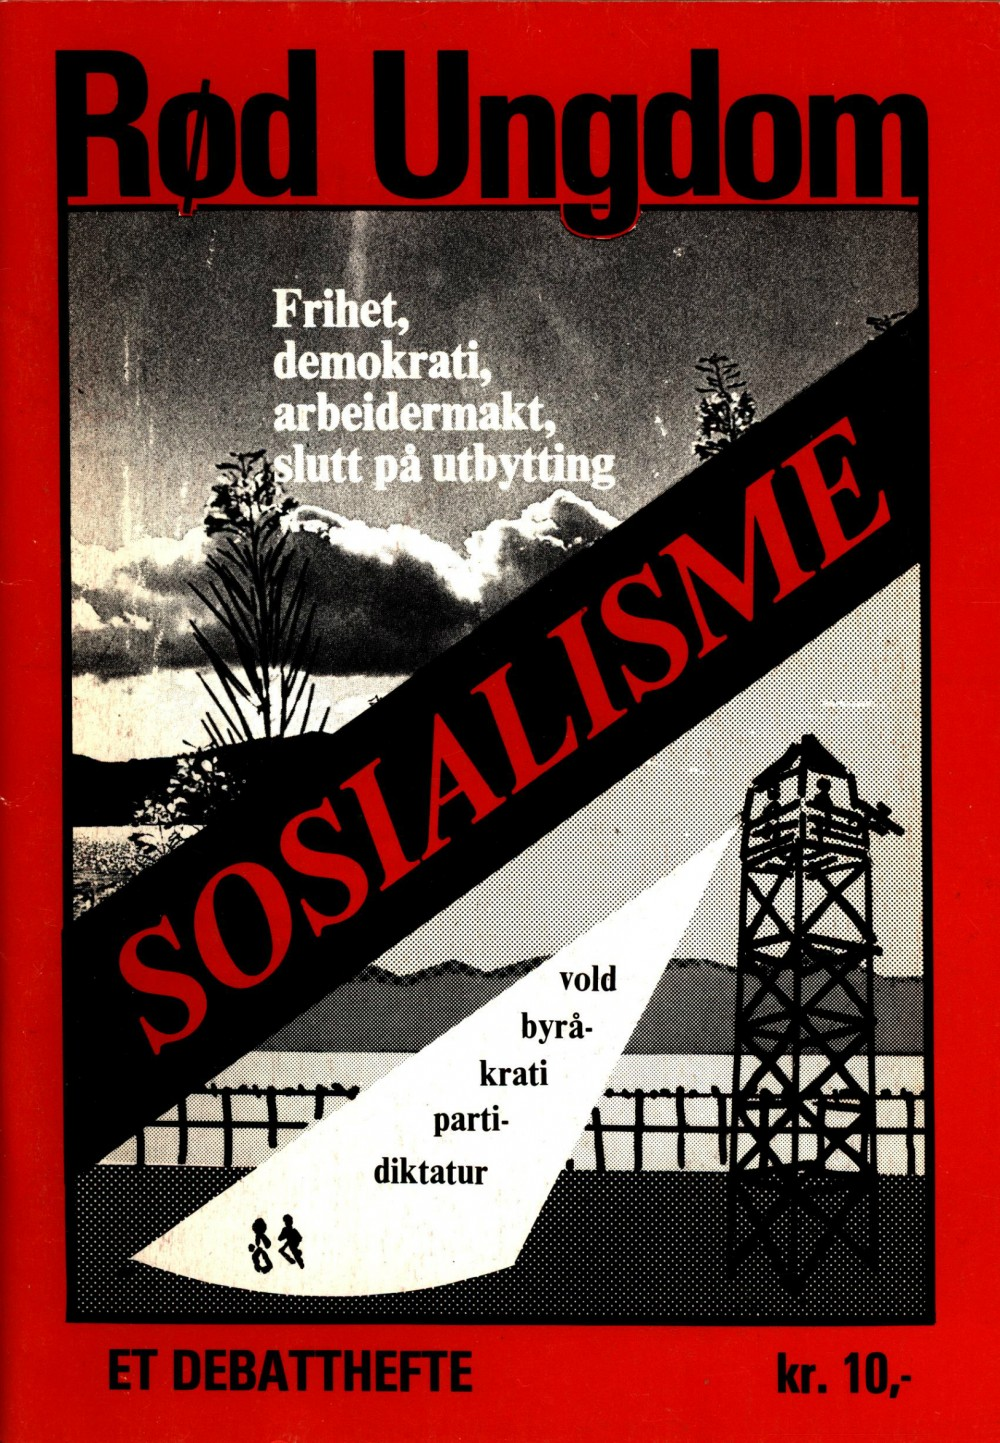 Per Erlandsen (red): Rød Ungdom: Sosialisme